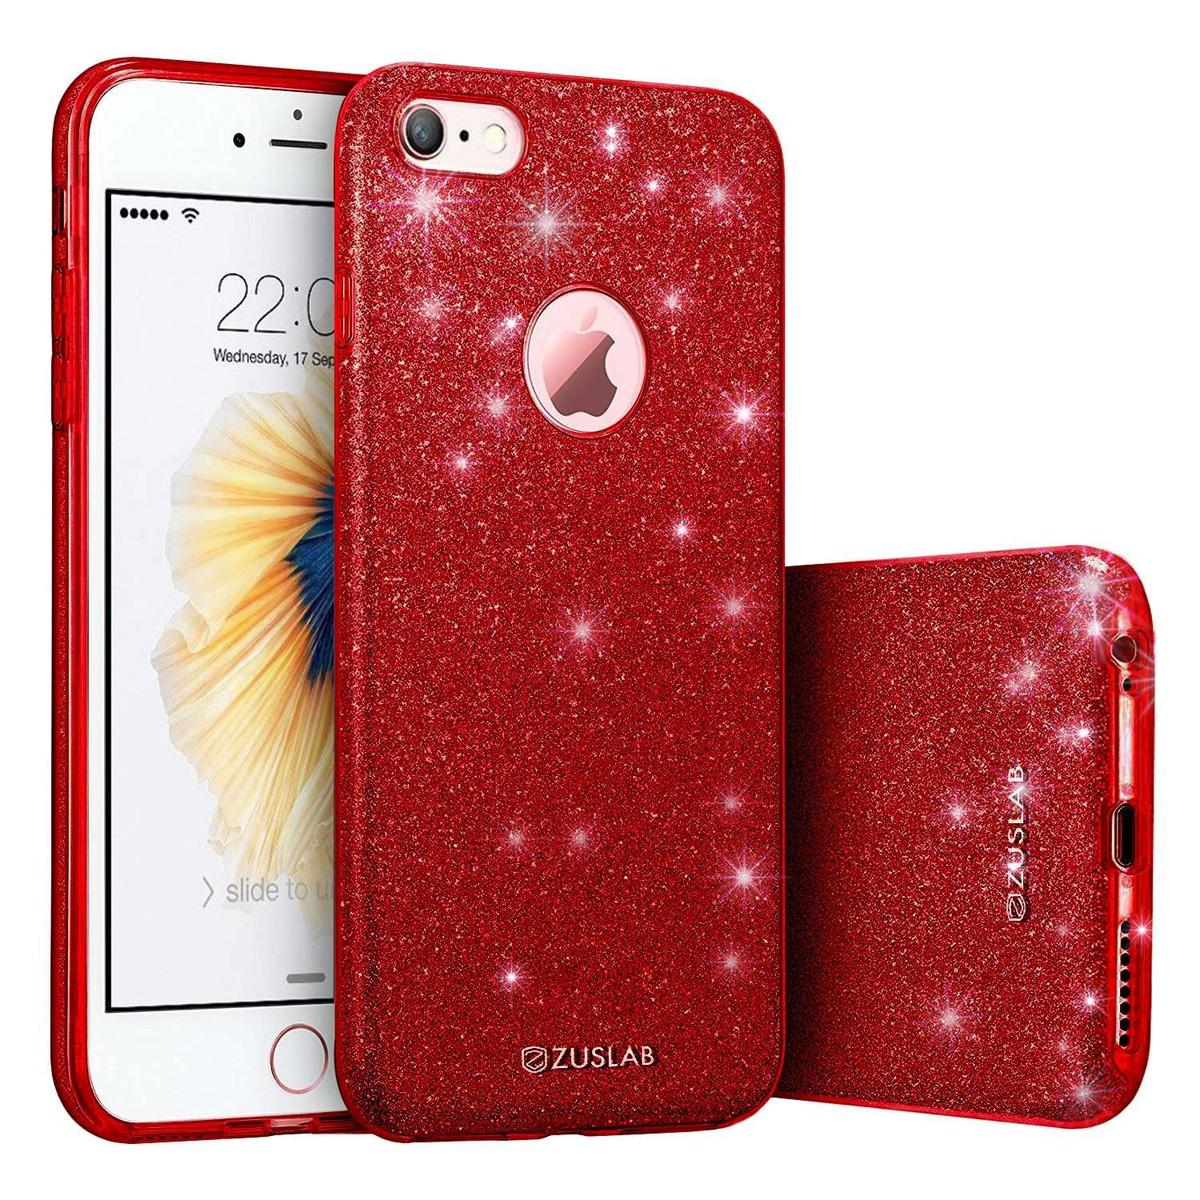 f61f2c3d7ad Funda iPhone 6 Plus / 6s Plus, Serie Zuslab Rosy, Bling Luxu - $ 869 ...